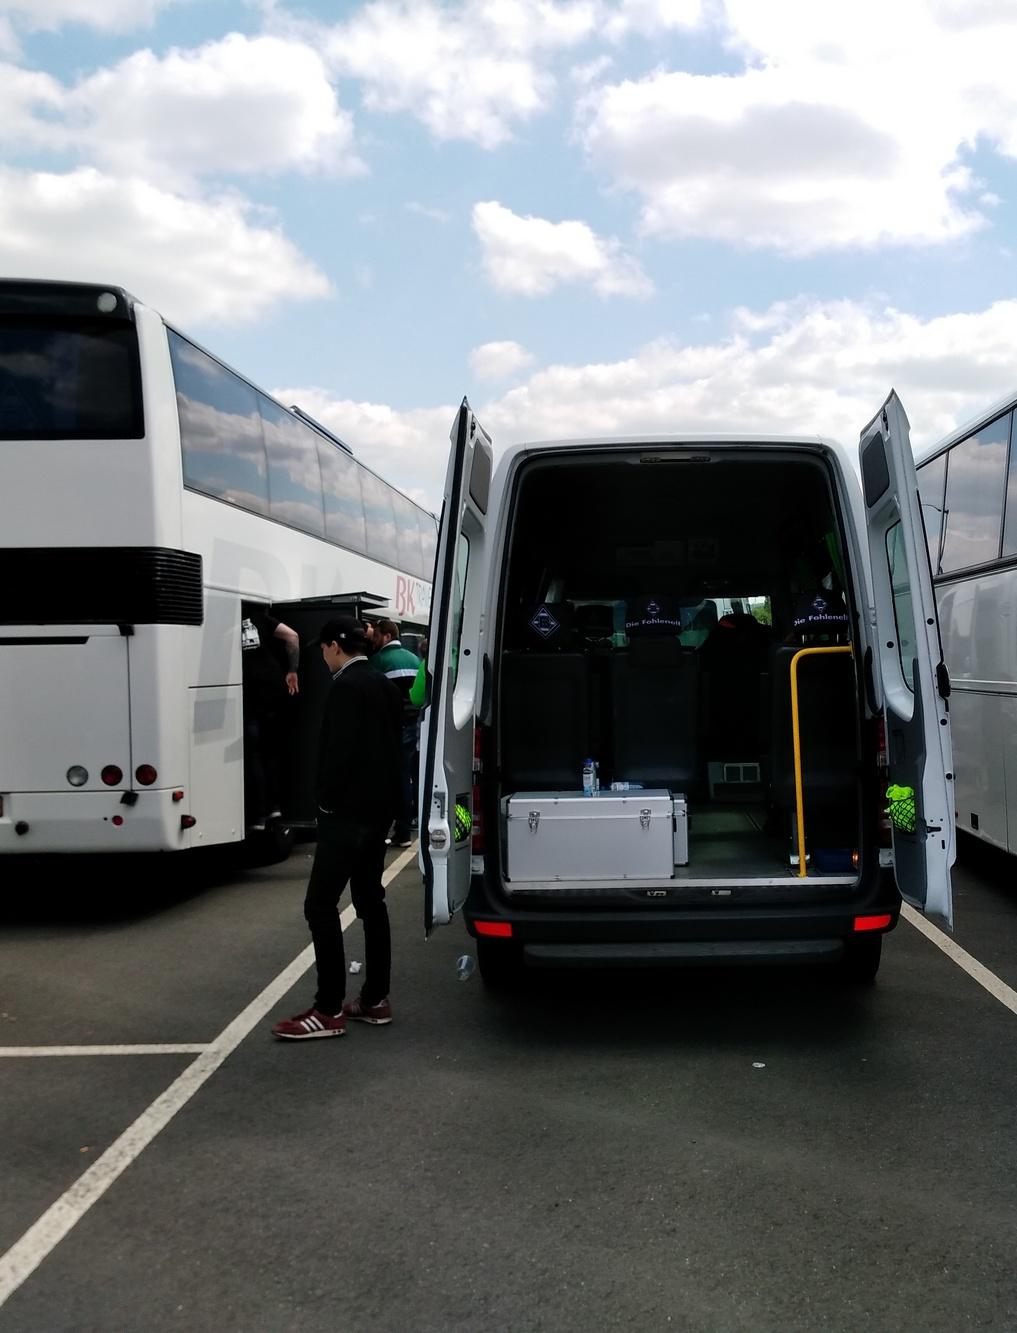 Rautenexpress Tour am 29.4.2017 nach Mainz